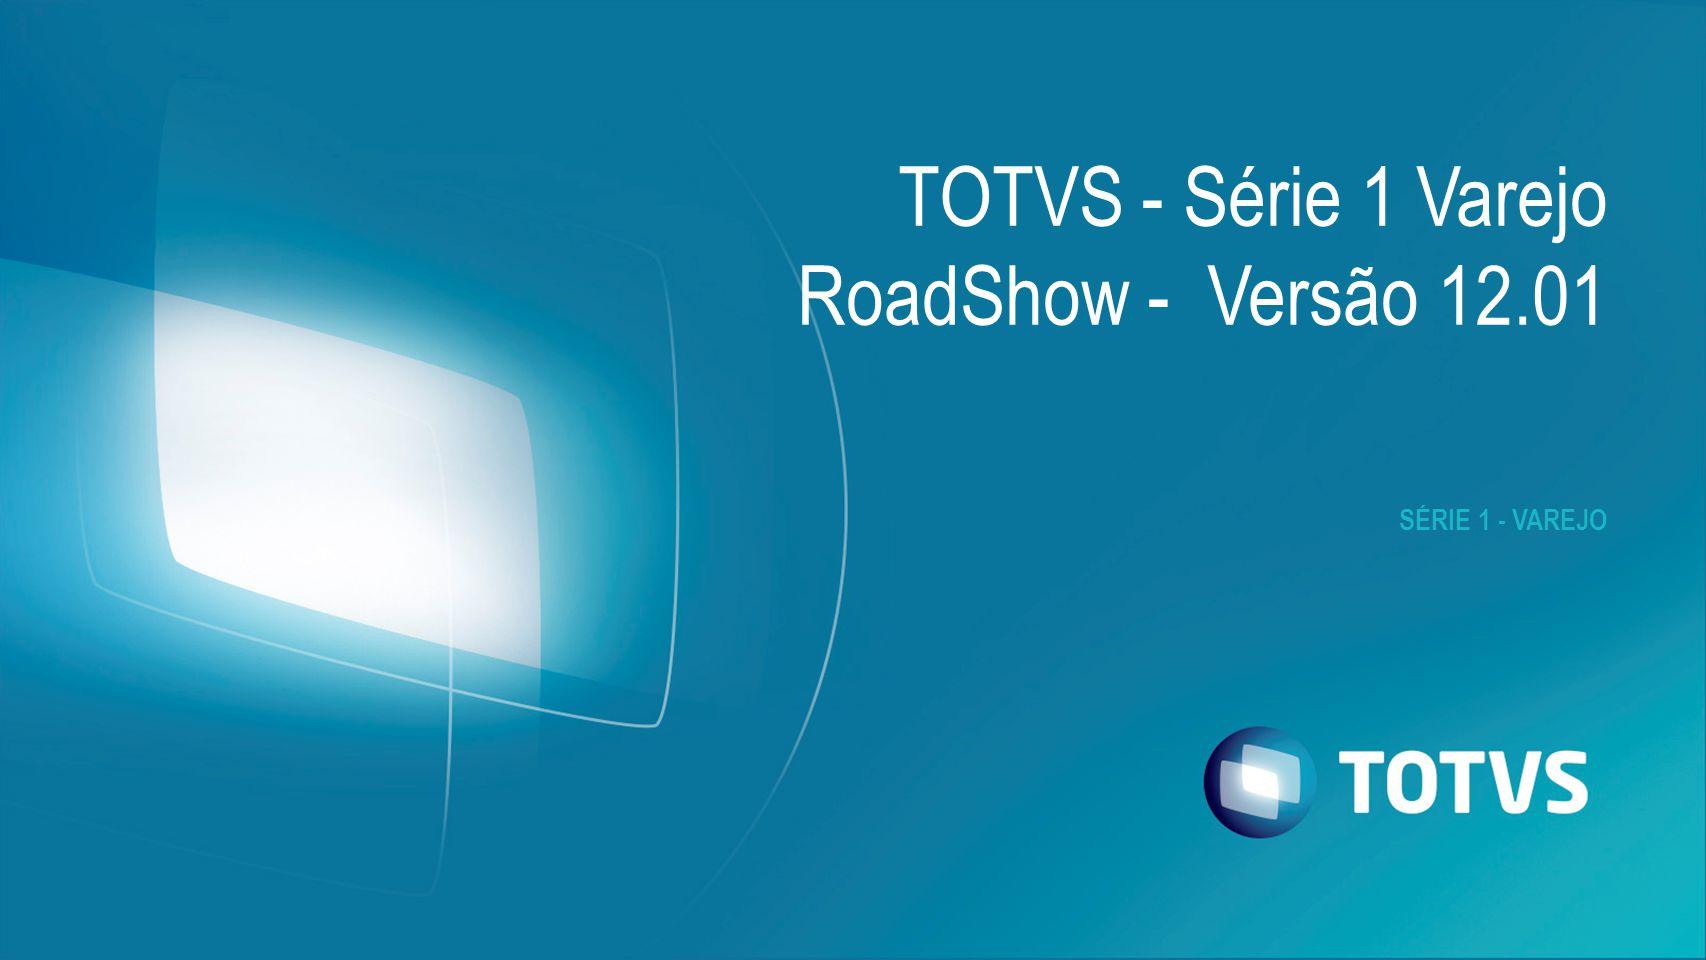 TOTVS - Série 1 Varejo RoadShow - Versão 12.01